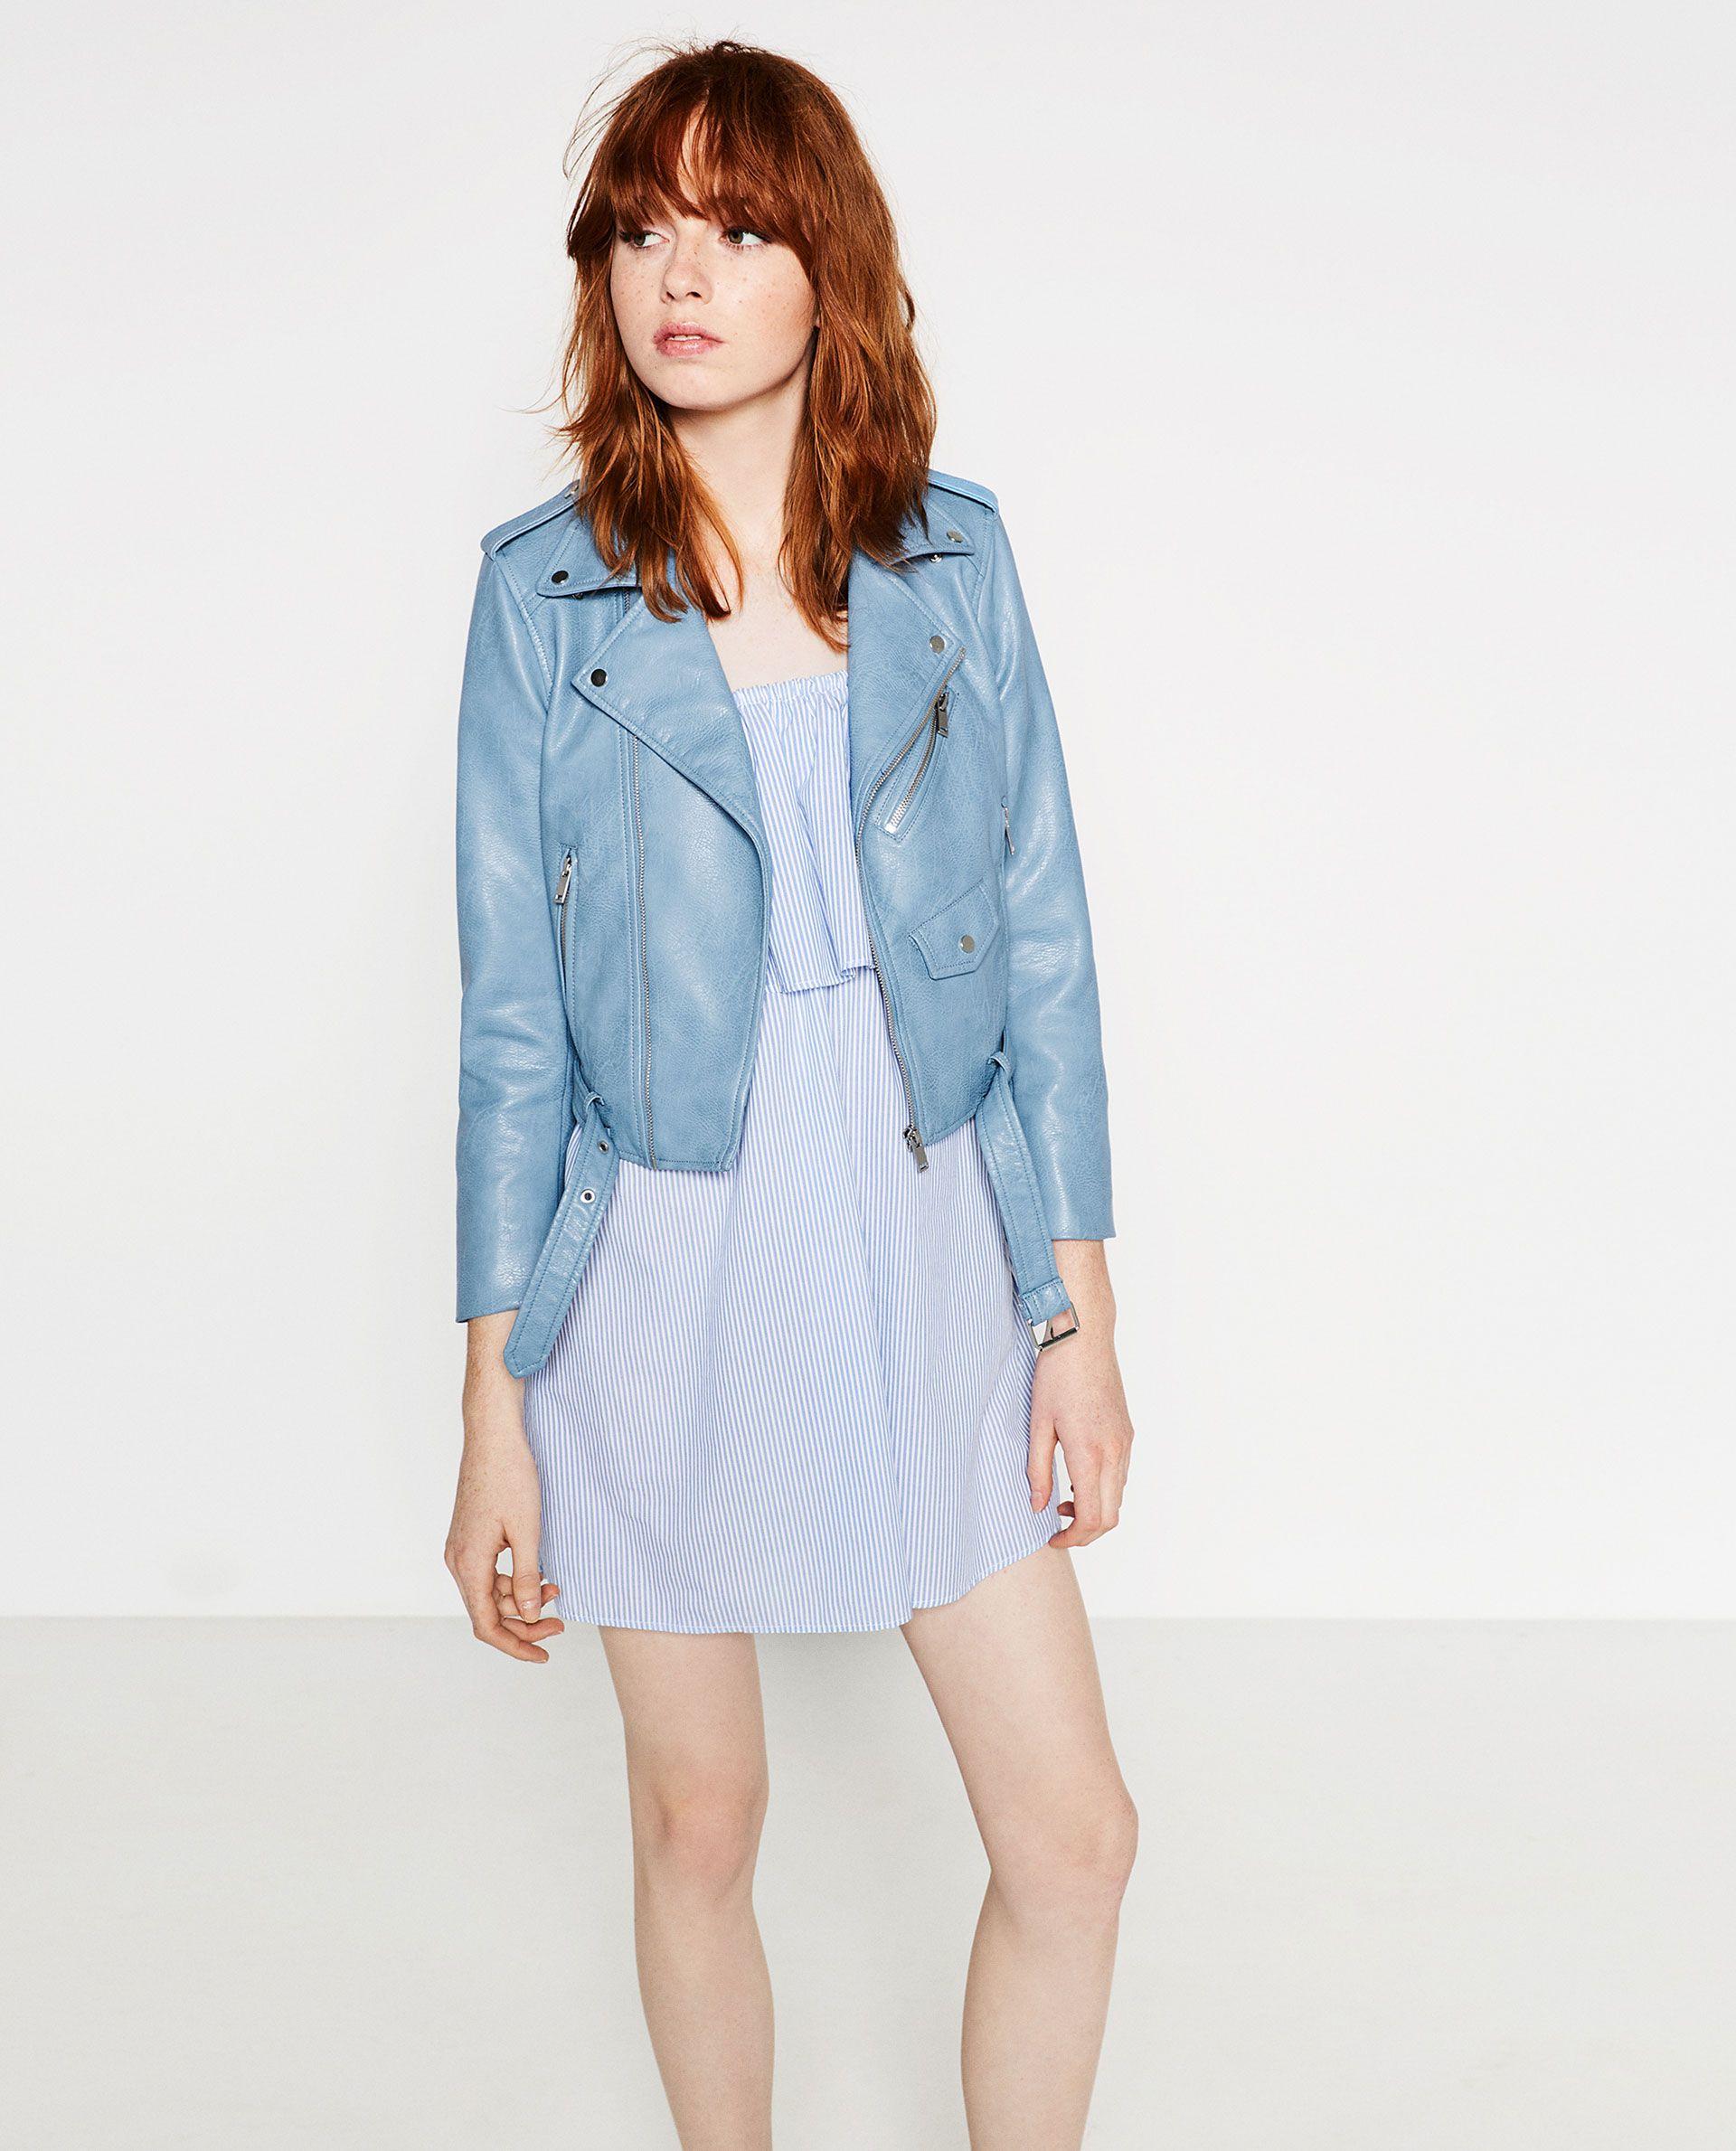 ZARA BLUE FAUX LEATHER JACKET Womens fashion jackets